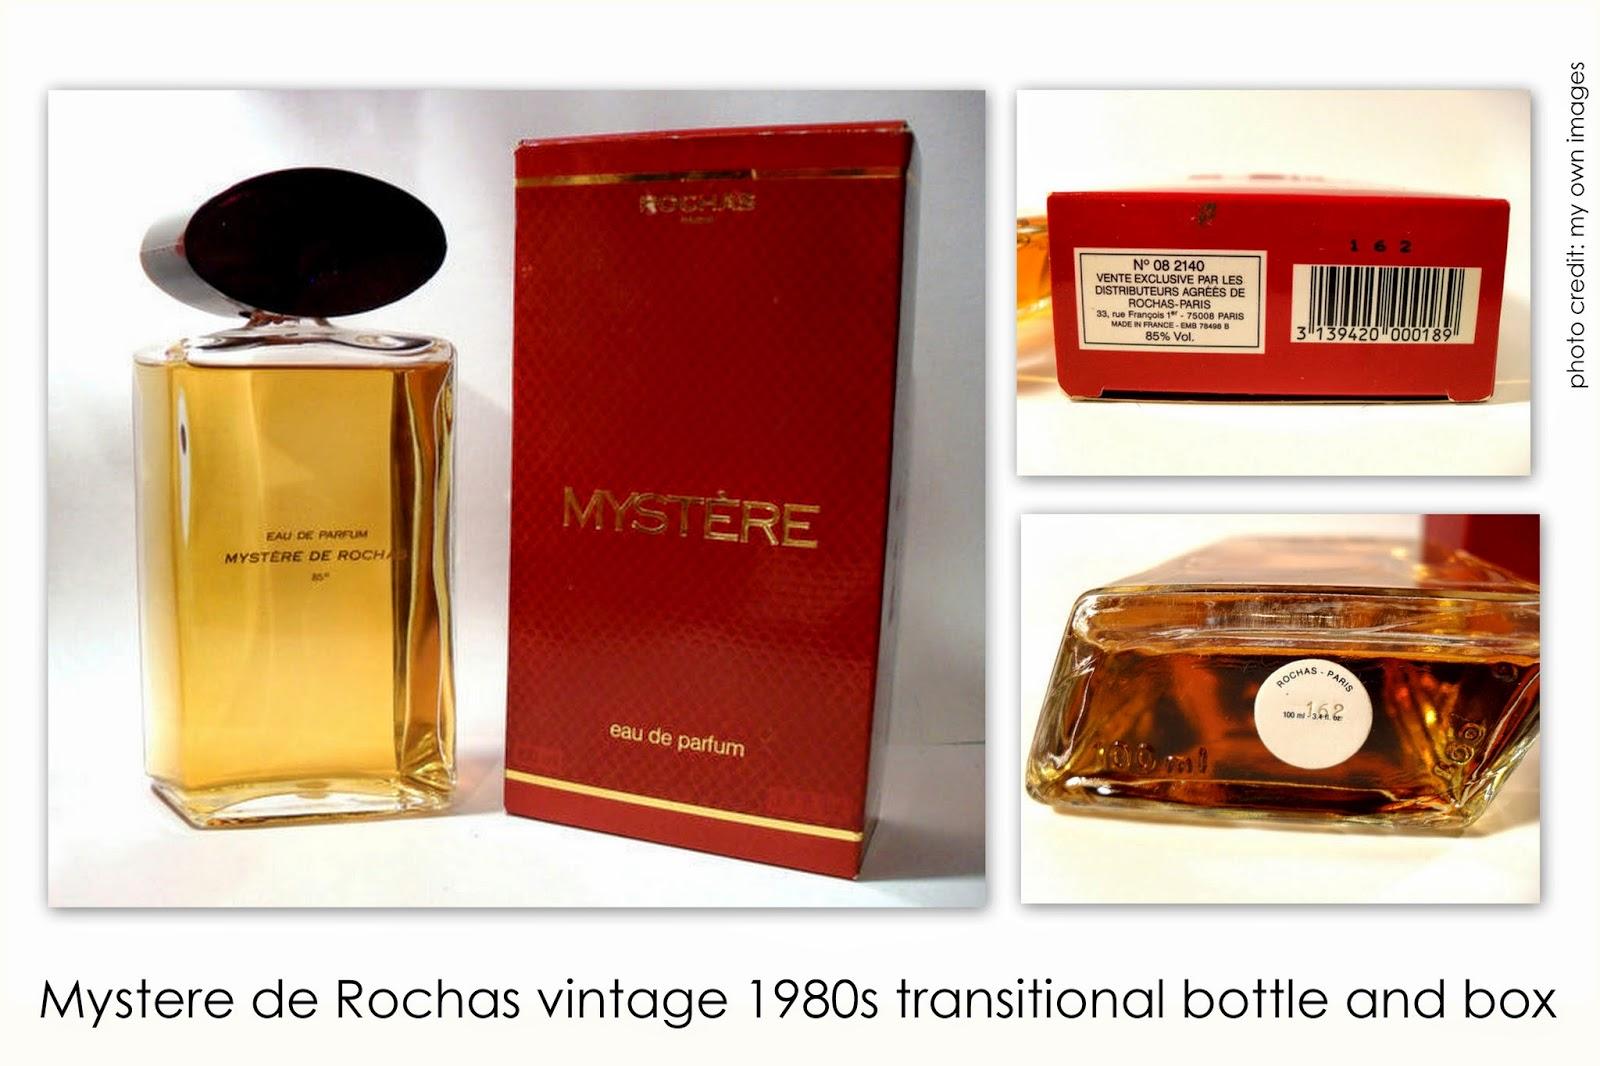 mystere perfume